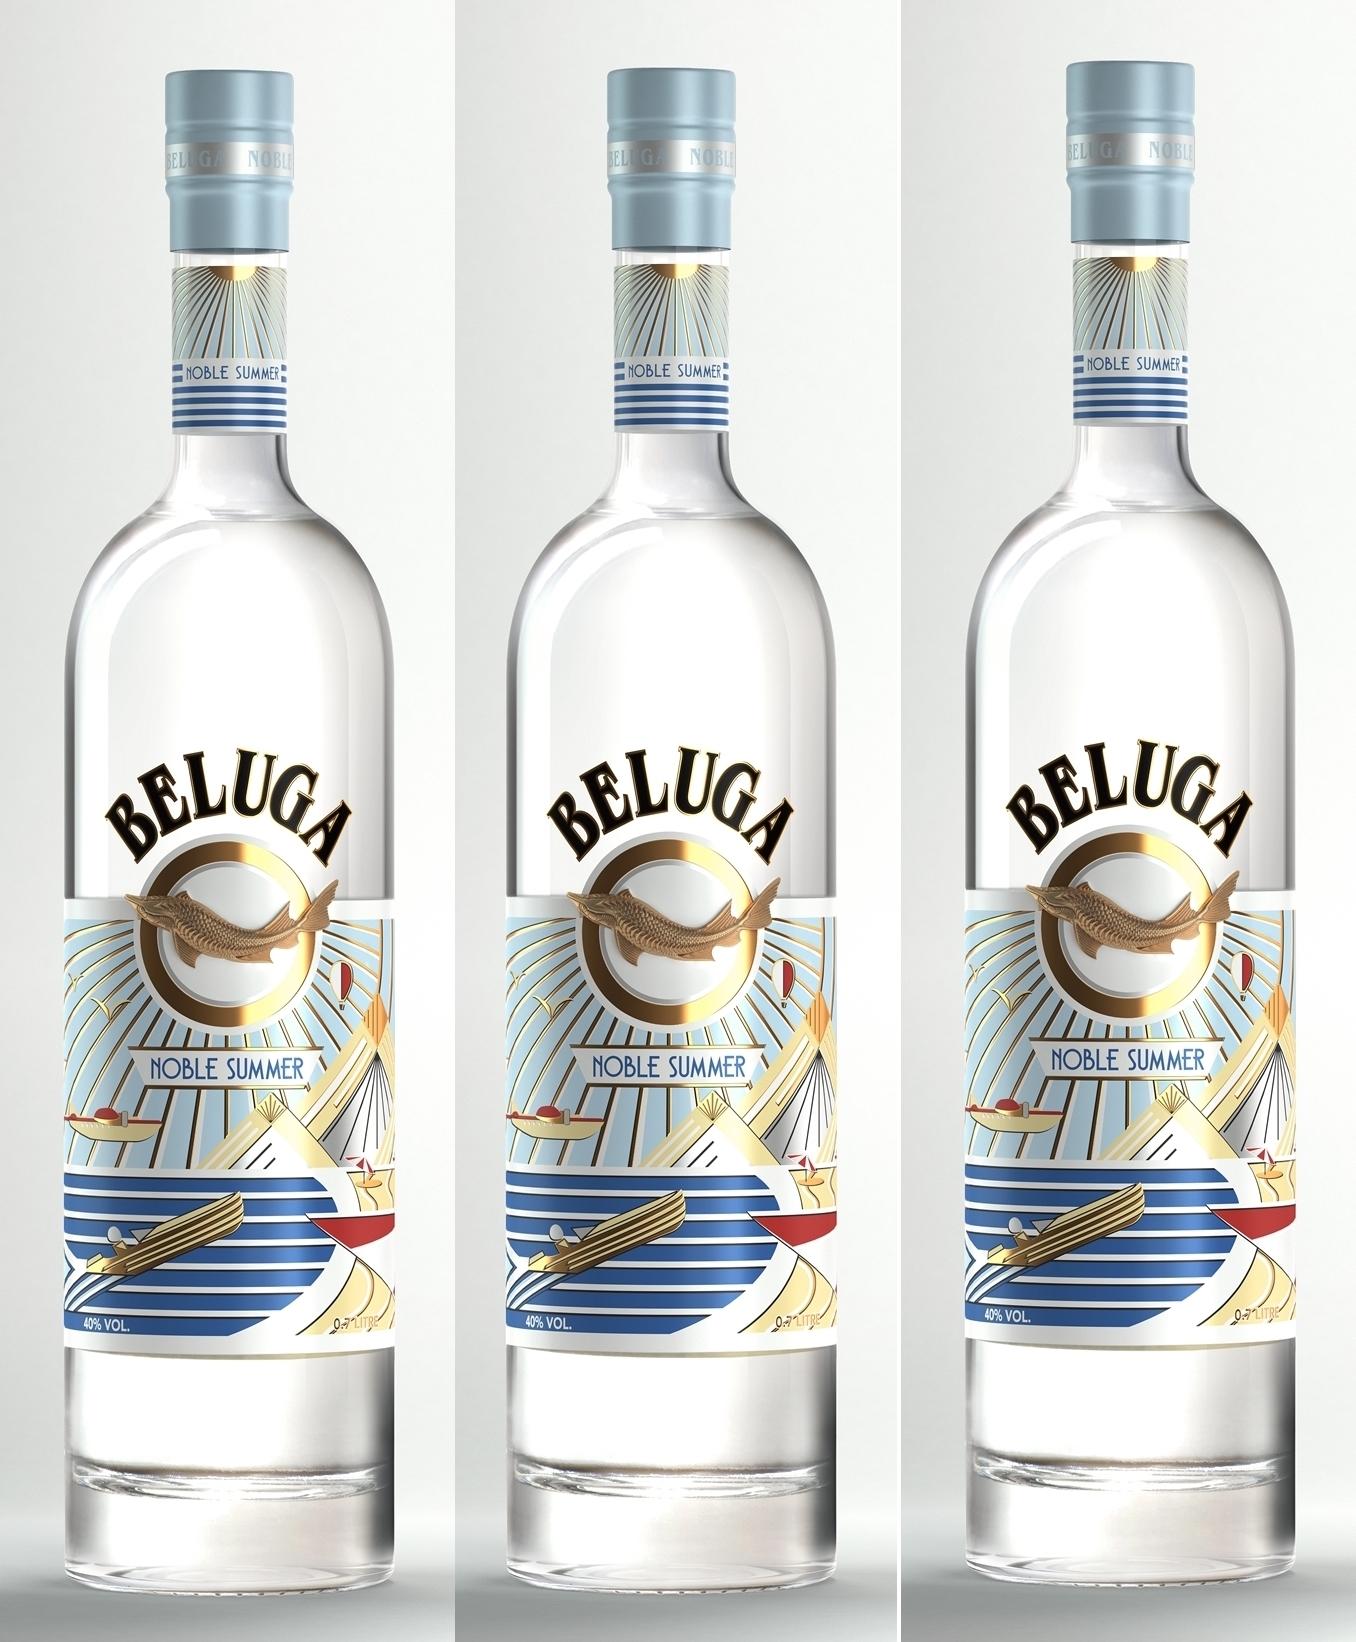 Beluga Noble Summer